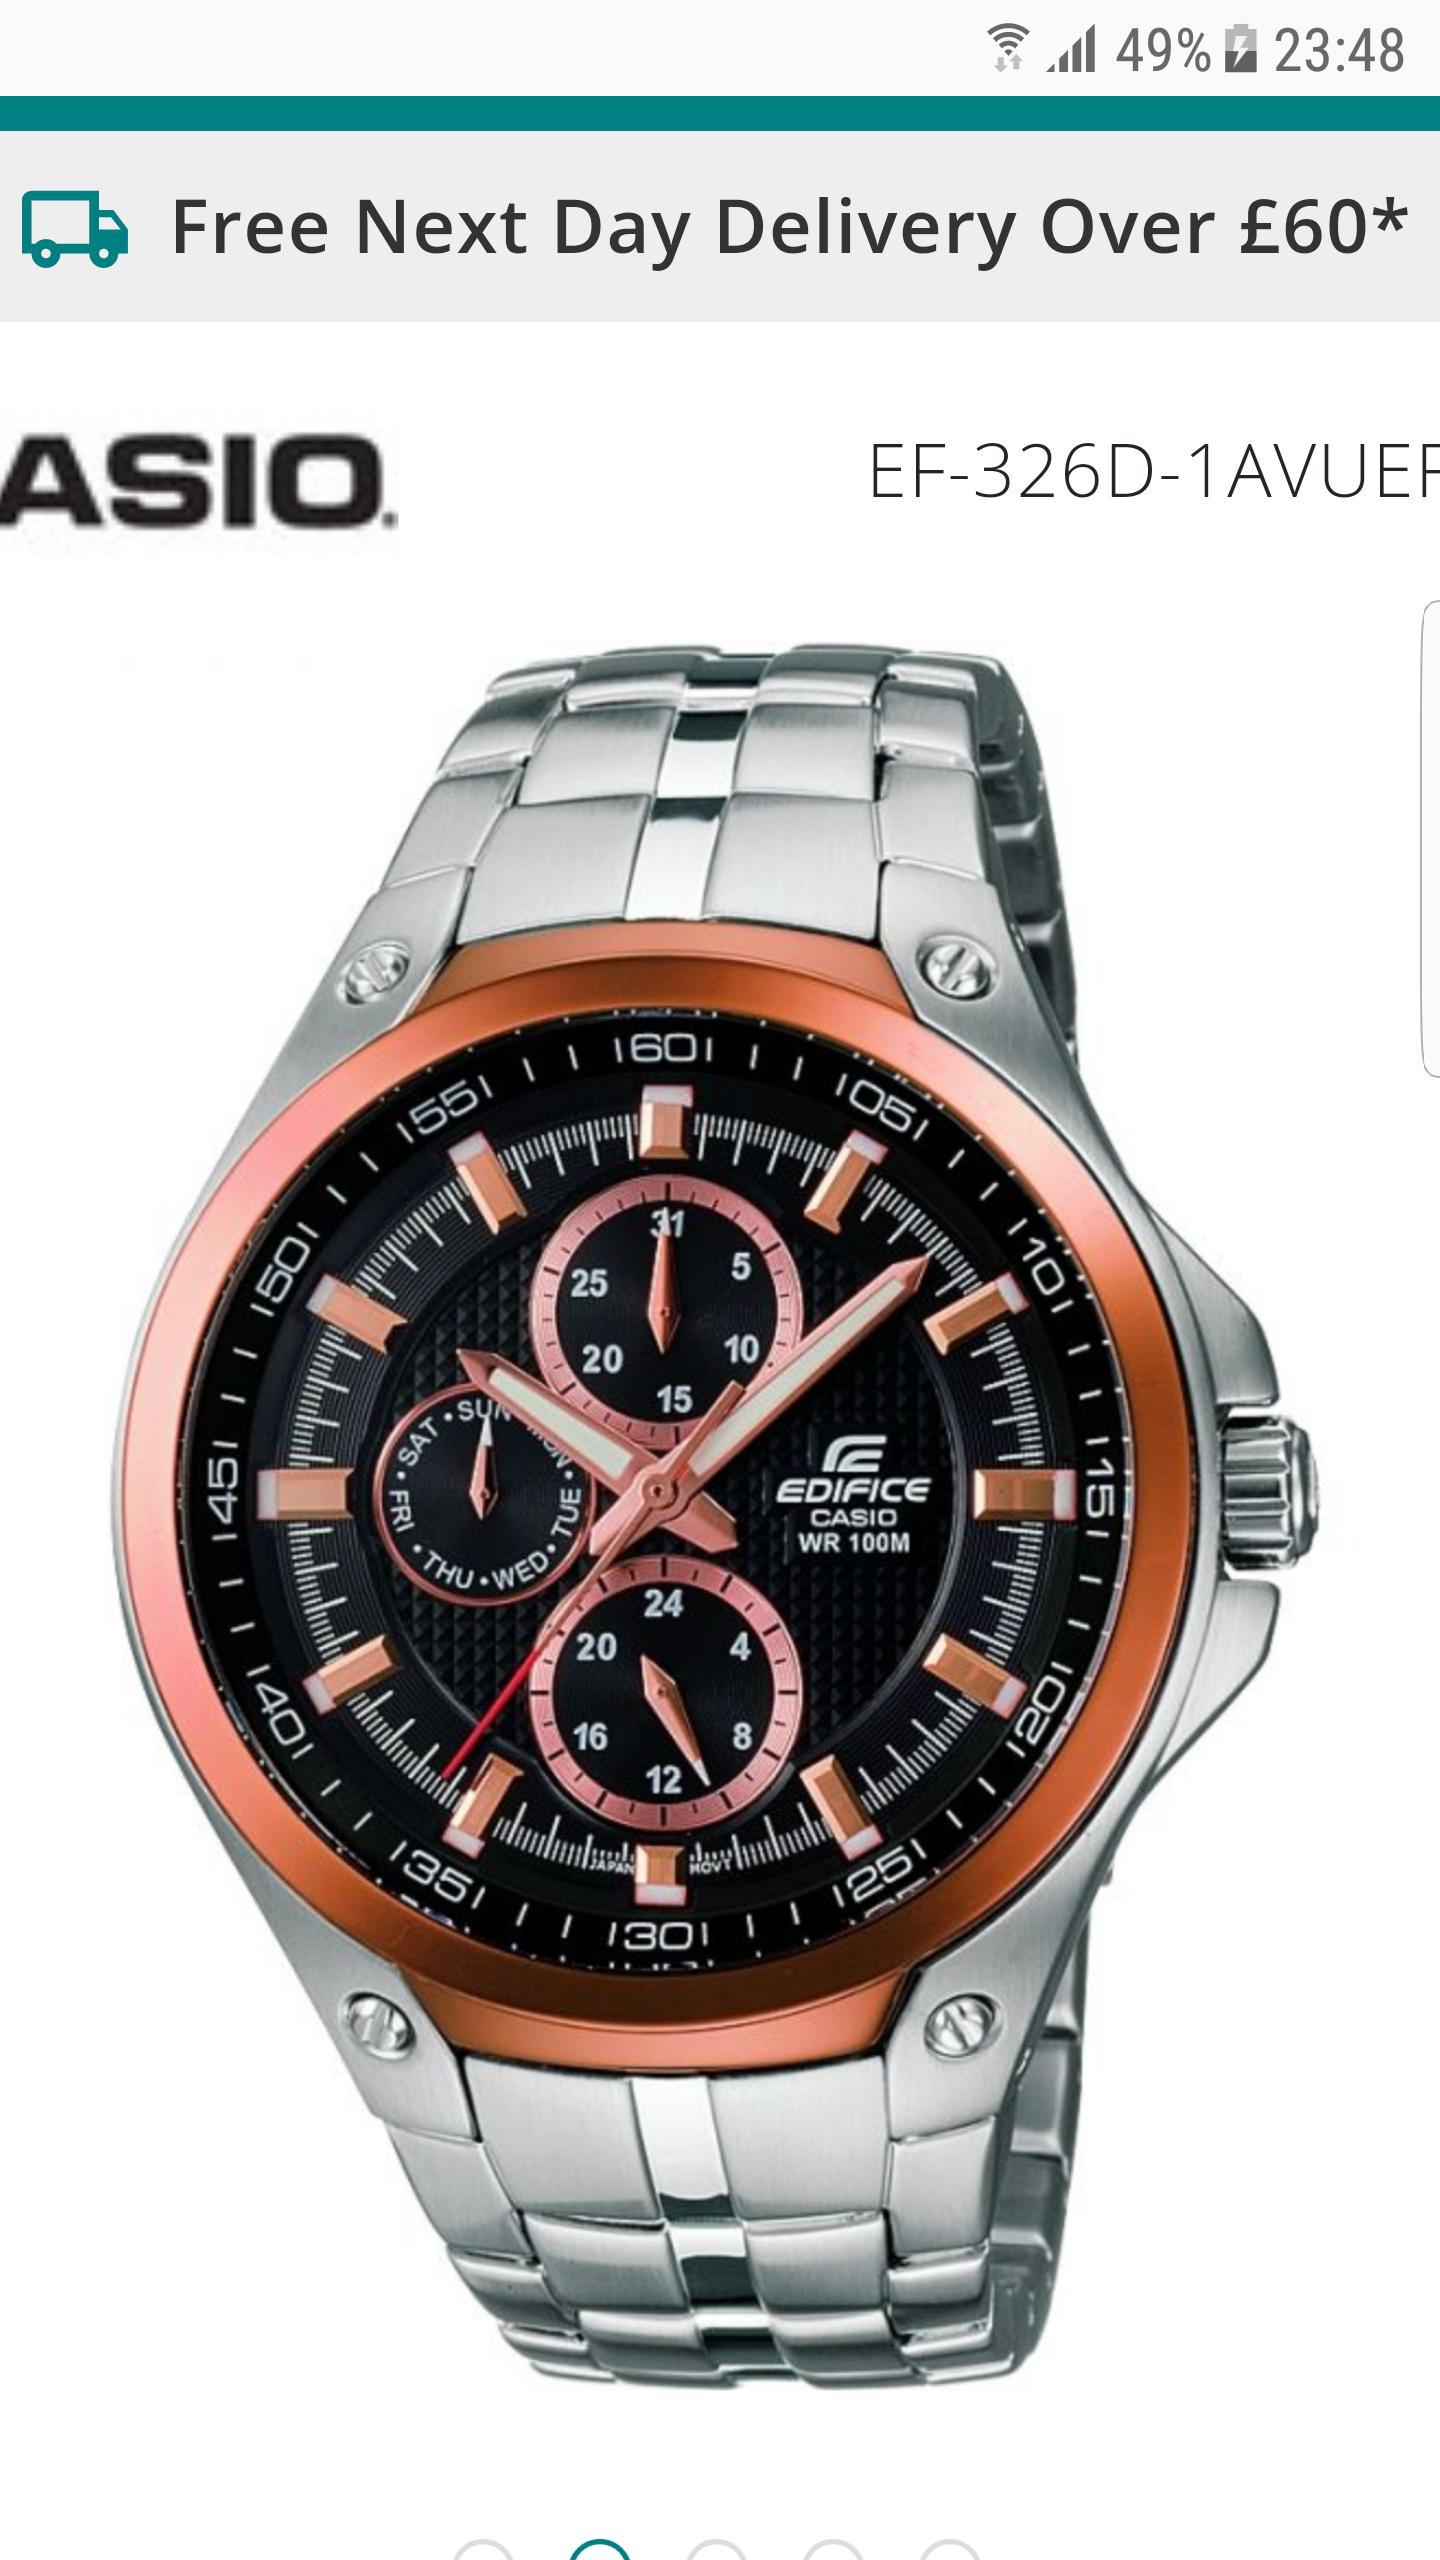 Mens Casio Edifice Watch EF-326D-1AVUEF £100 @ WatchShop